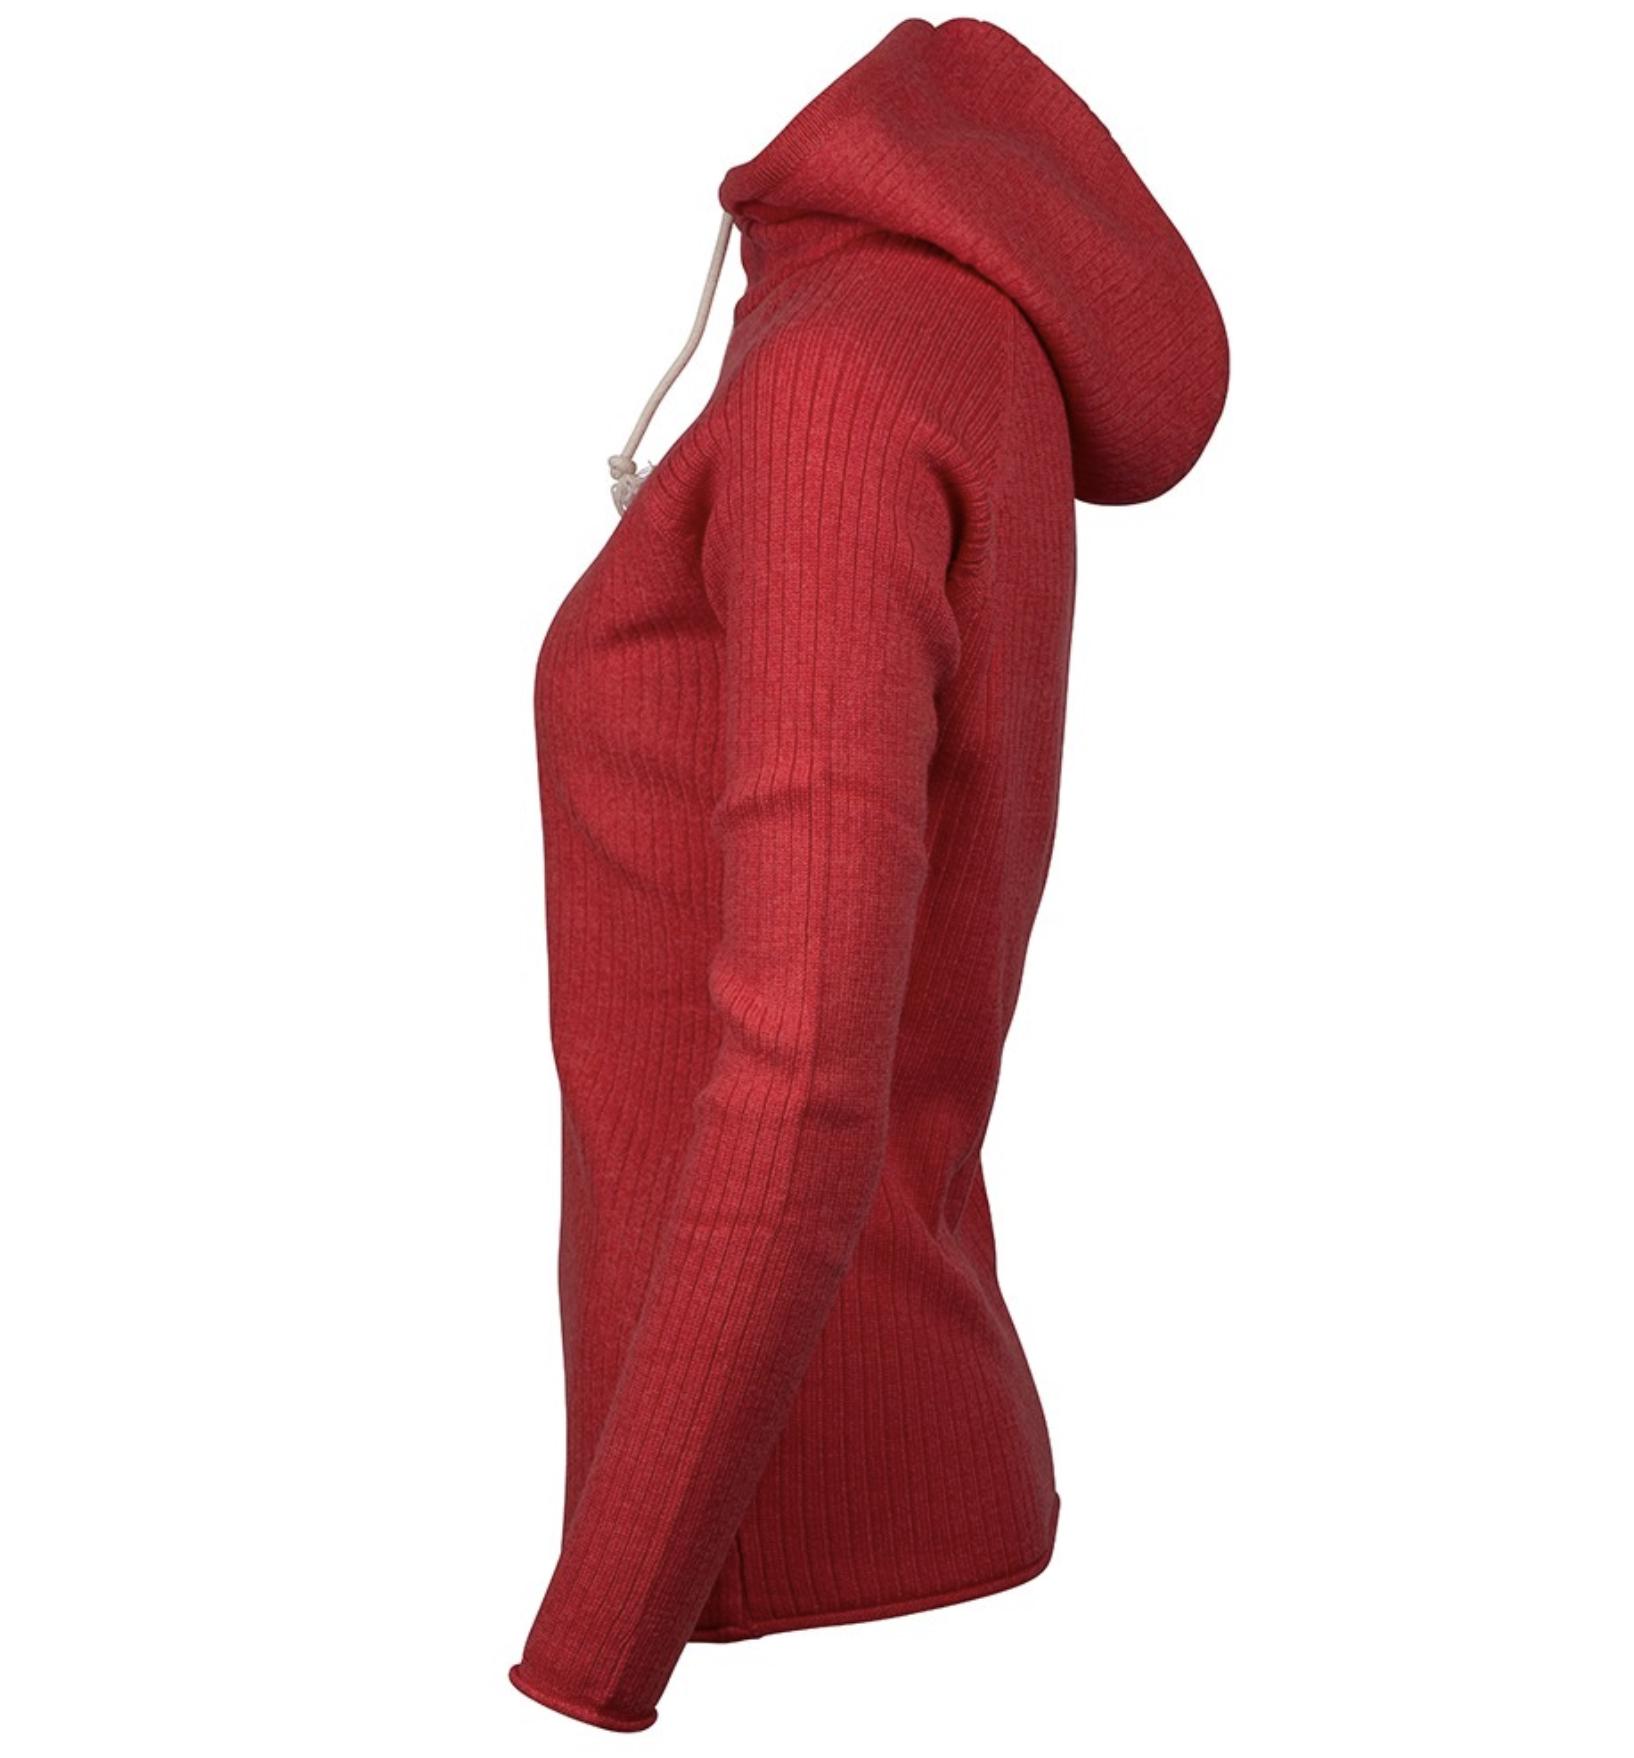 Bilde av Amundsen Boiled hoodie womwns WSW14.1.160